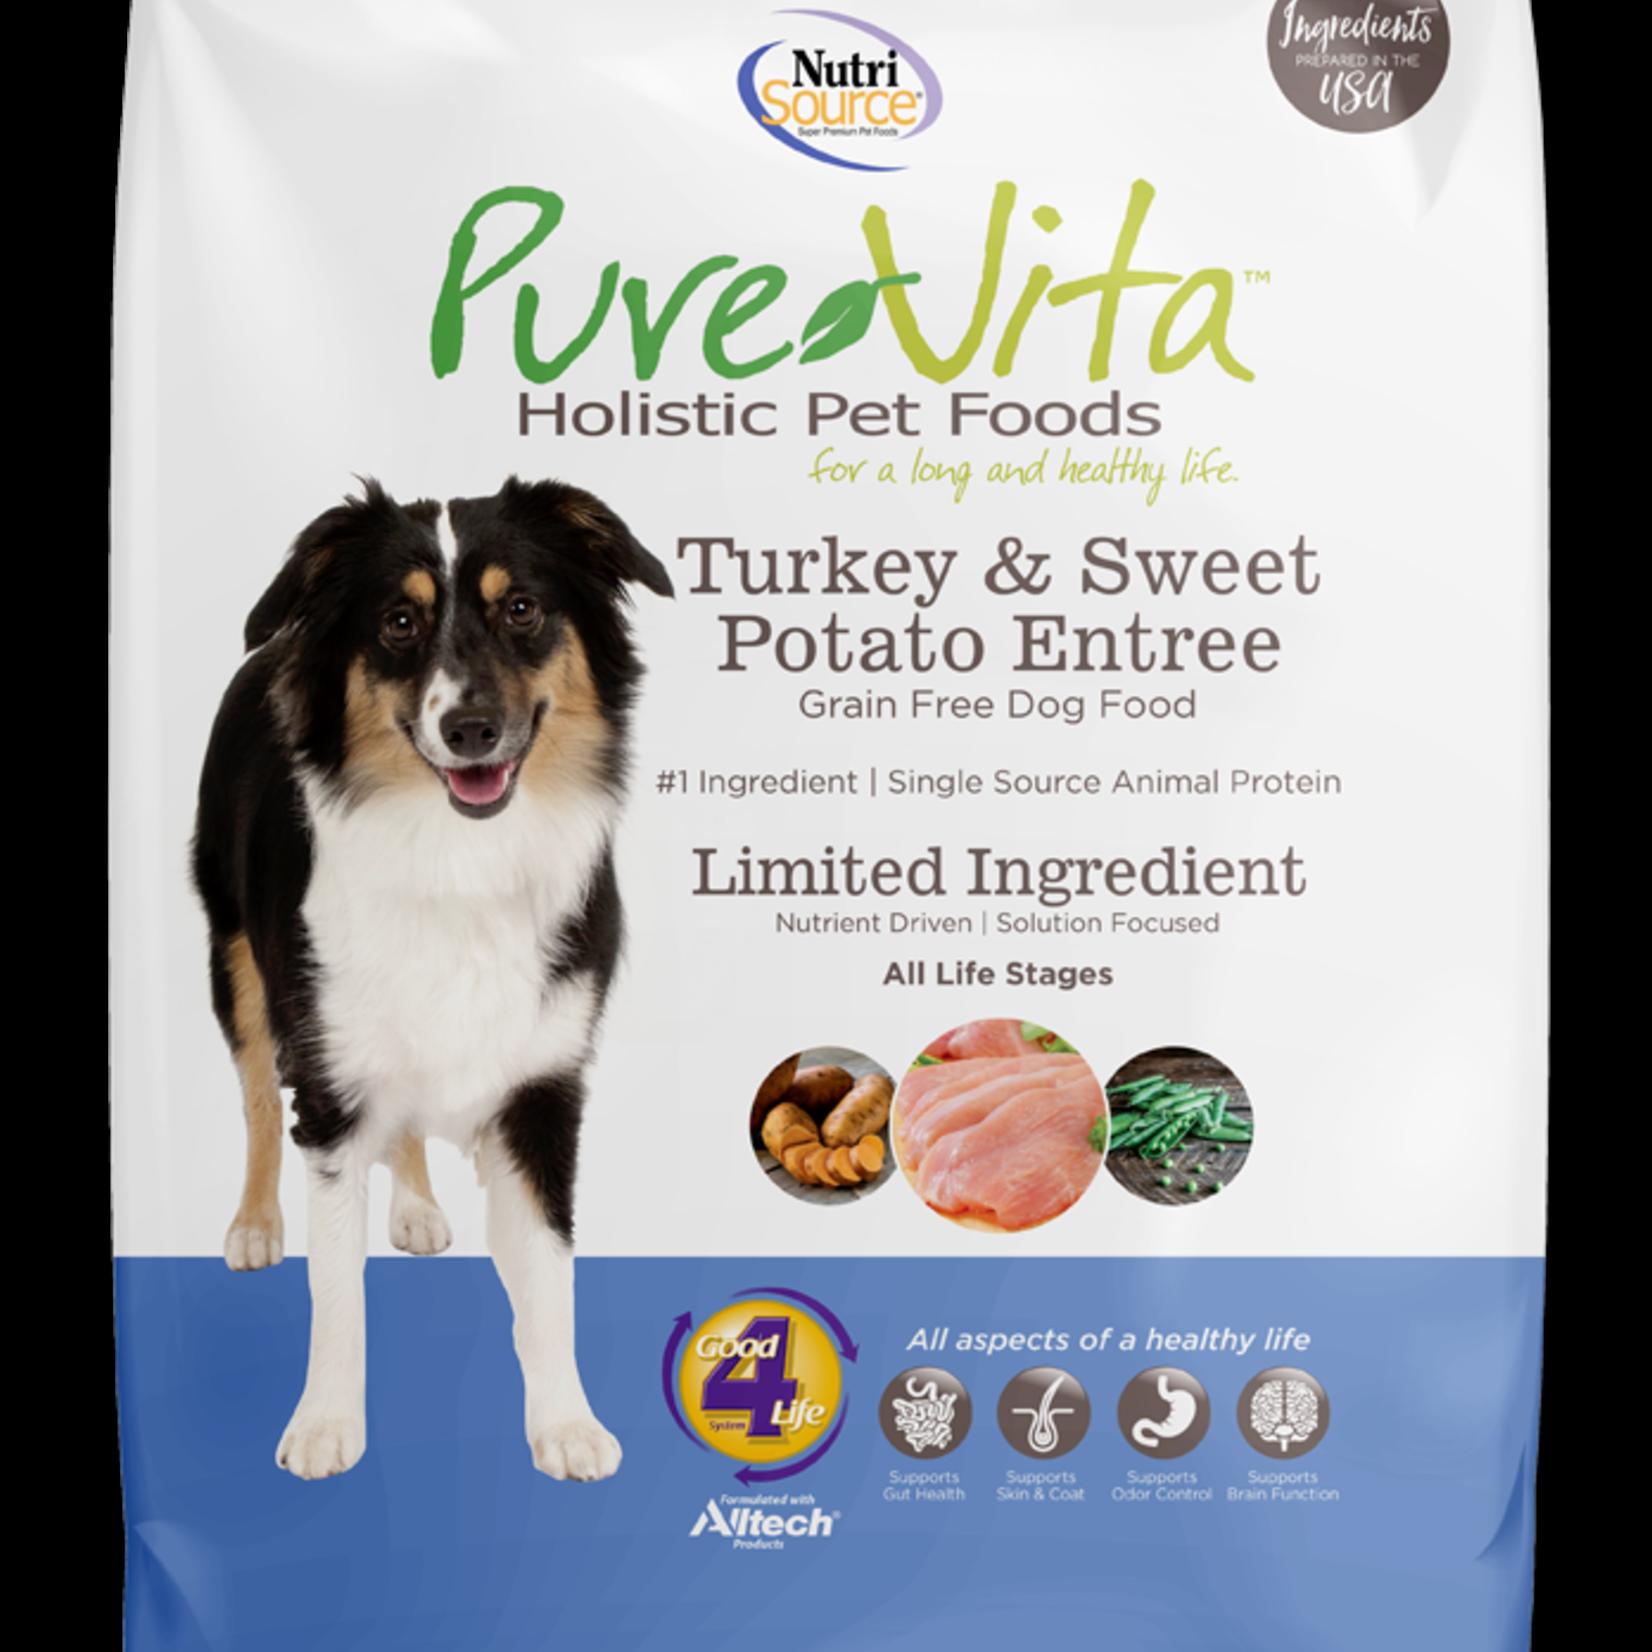 PureVita Pure Vita Dog GF Turkey & Sweet Potato 15#